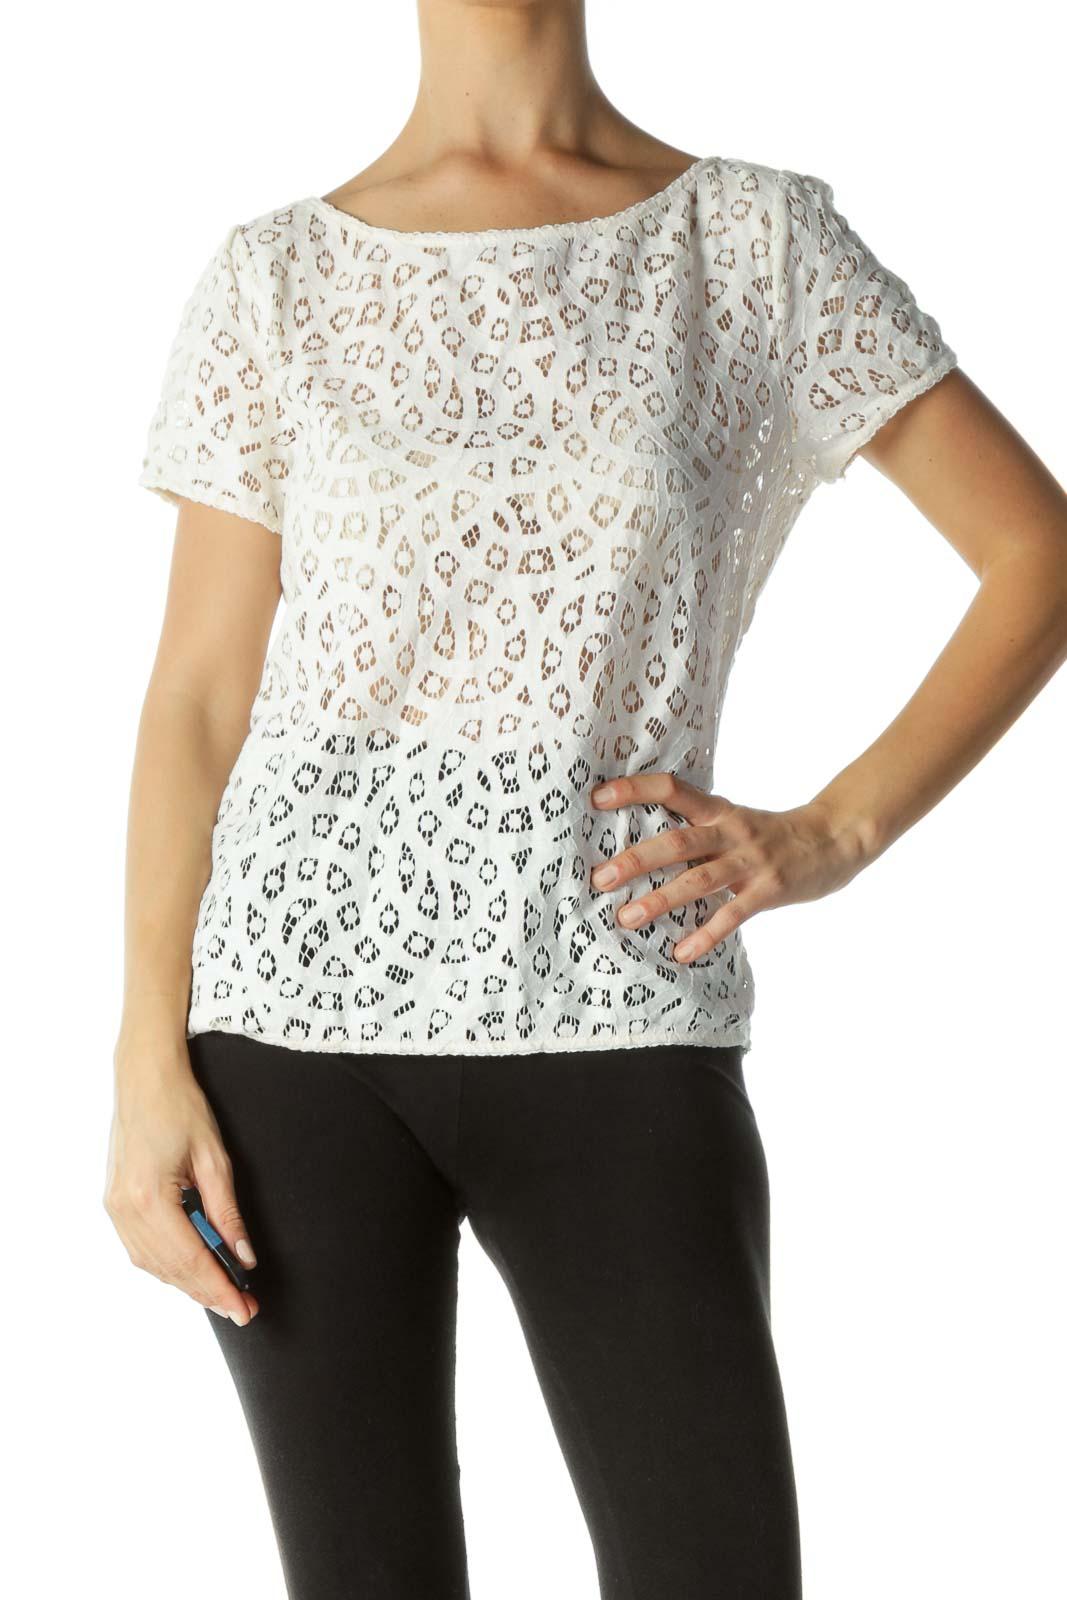 White Crocheted T-shirt